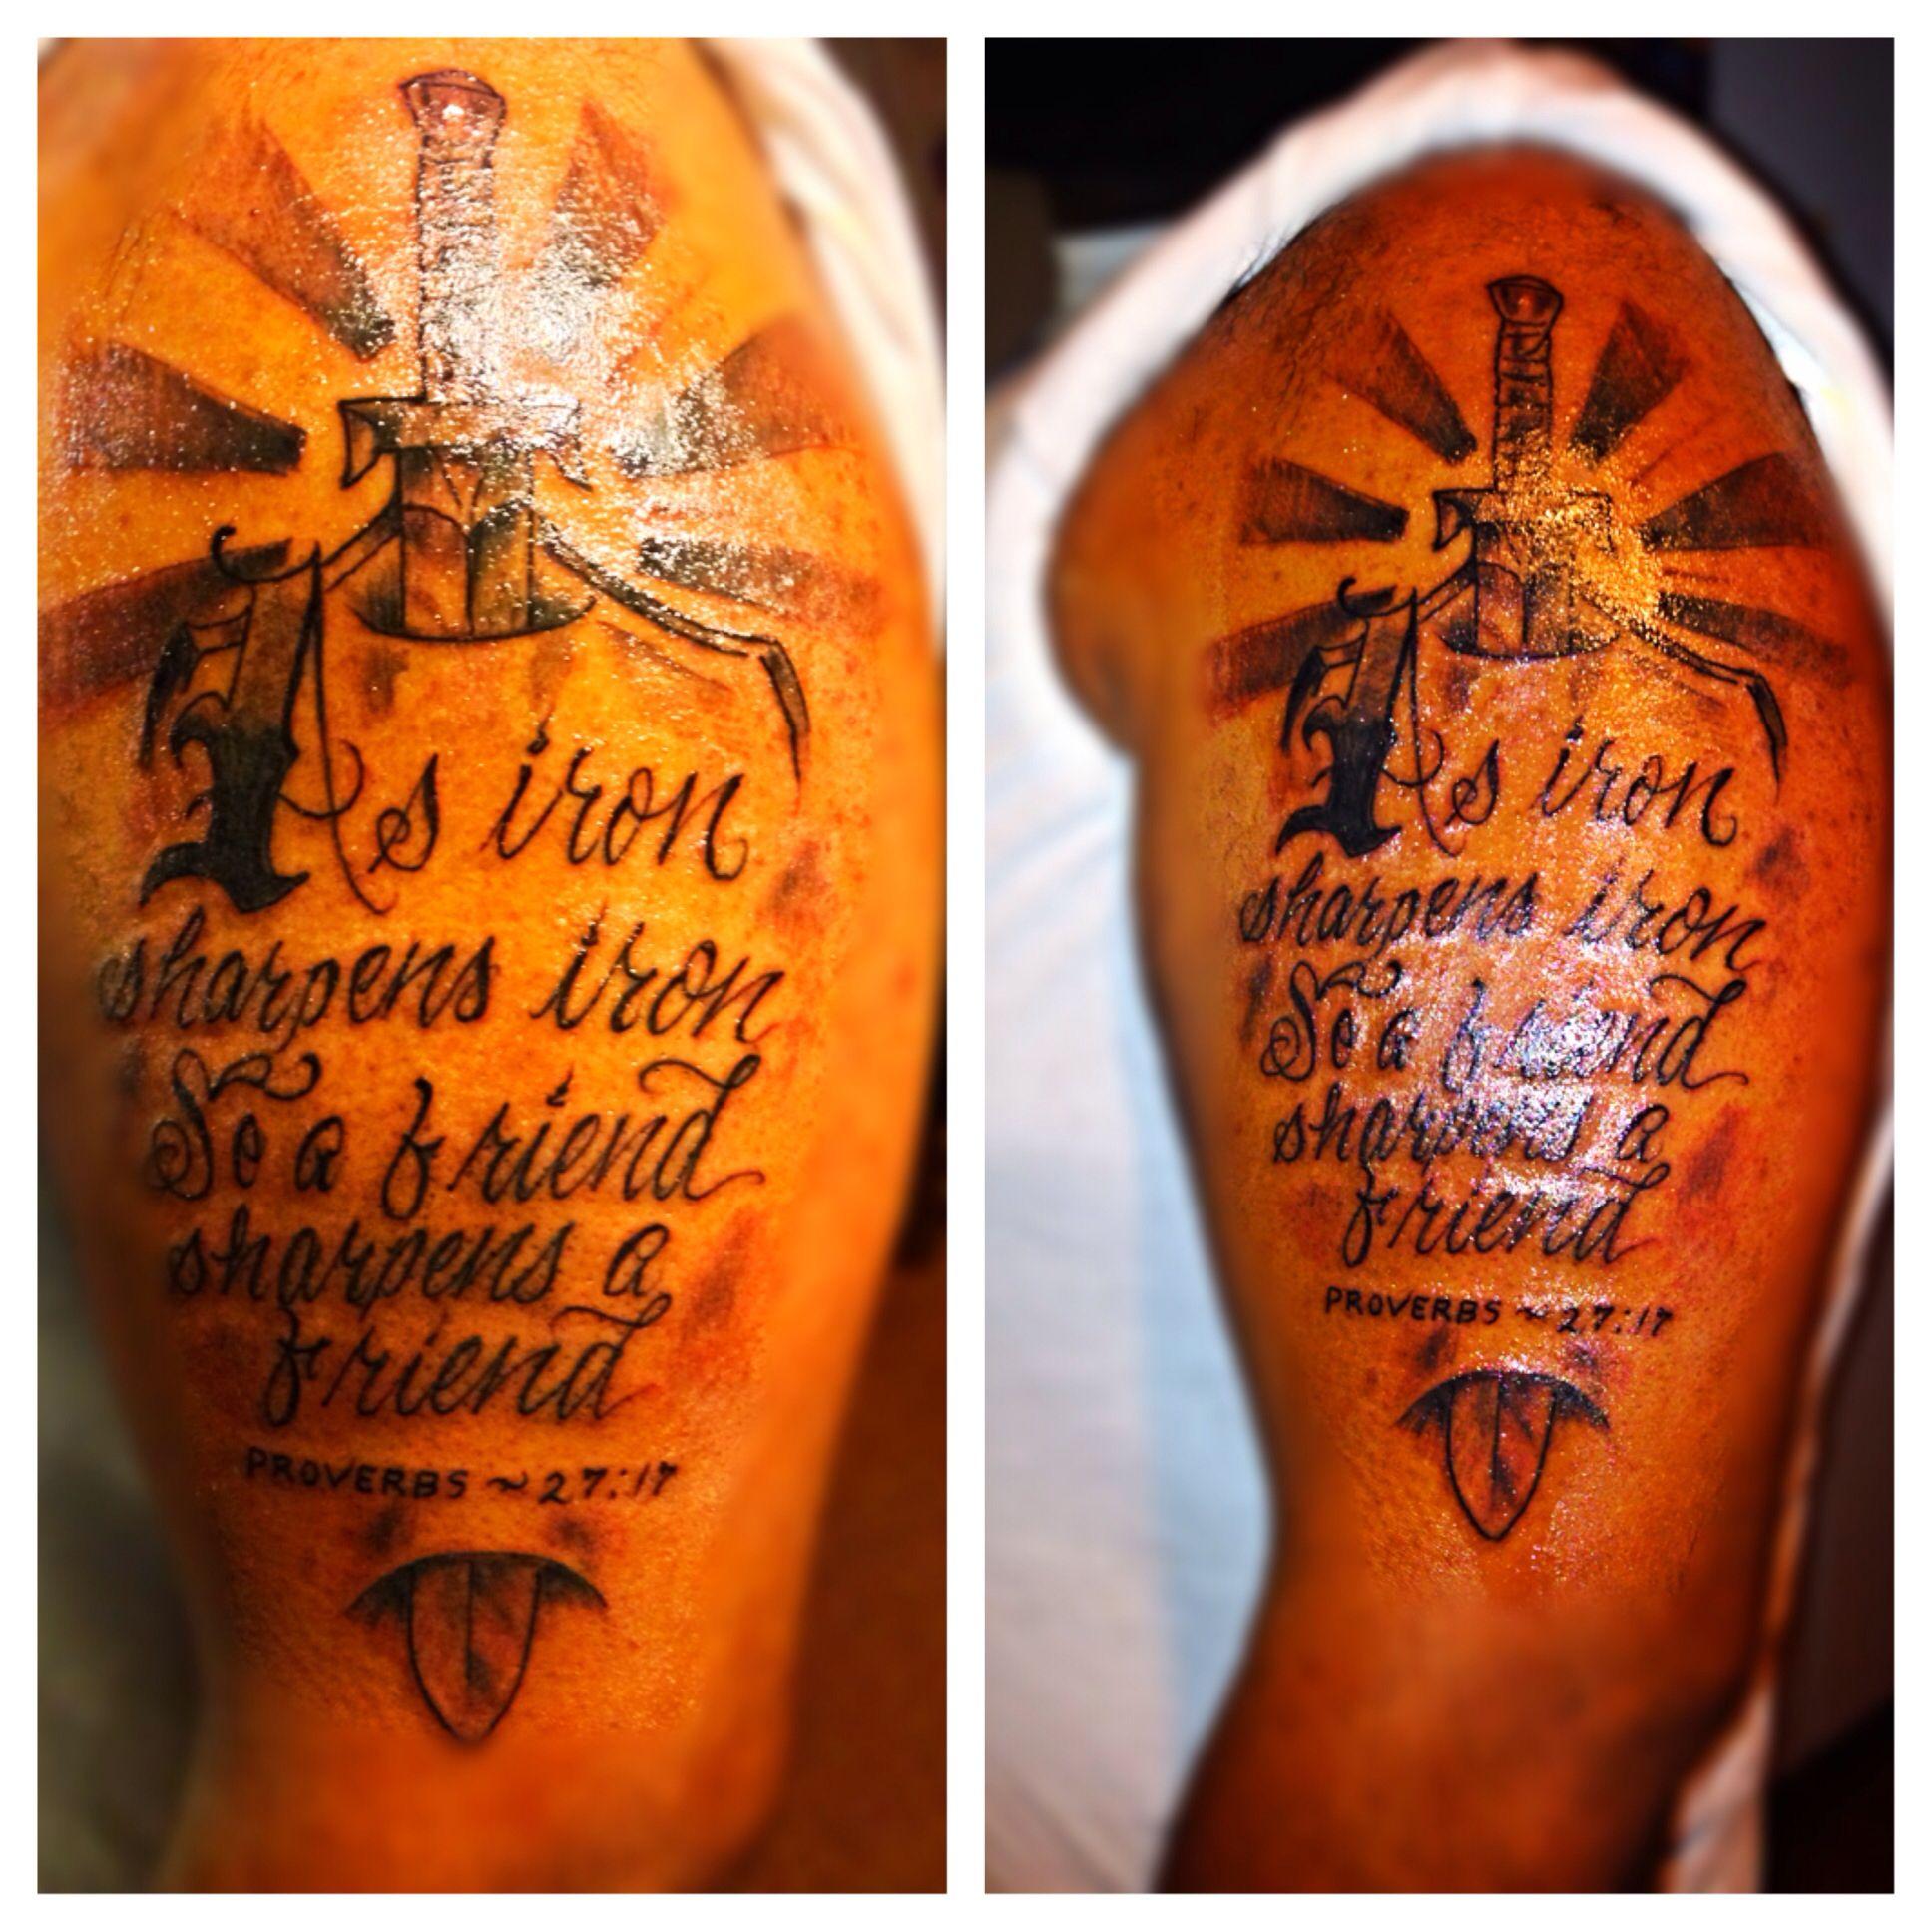 As iron sharpens iron so a friend sharpens a friend for Tattoos good or bad bible